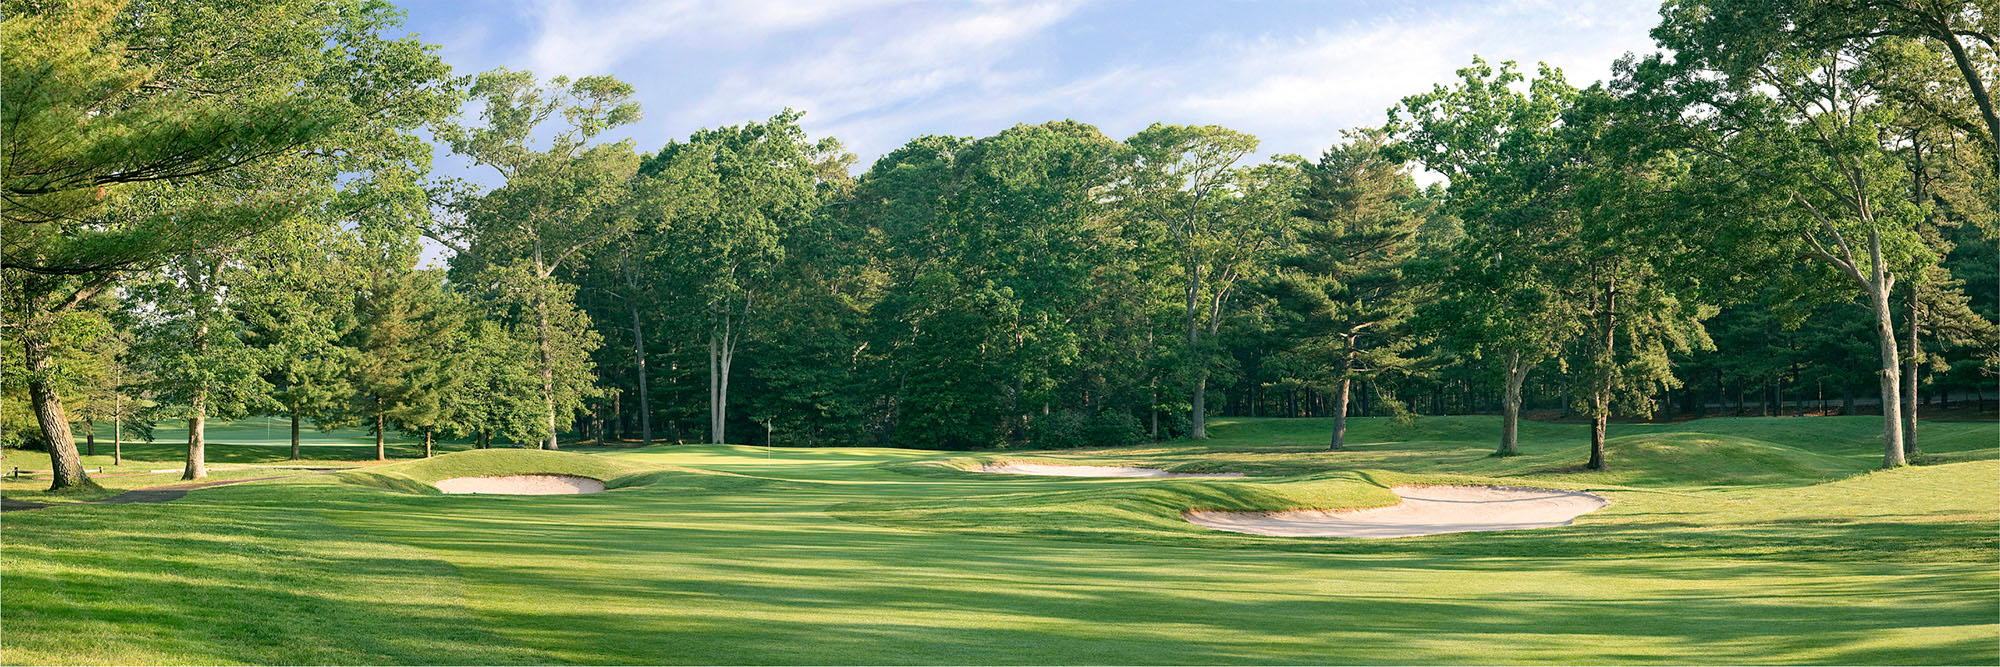 Golf Course Image - Sea View Resort & Spa Pine Course No. 16